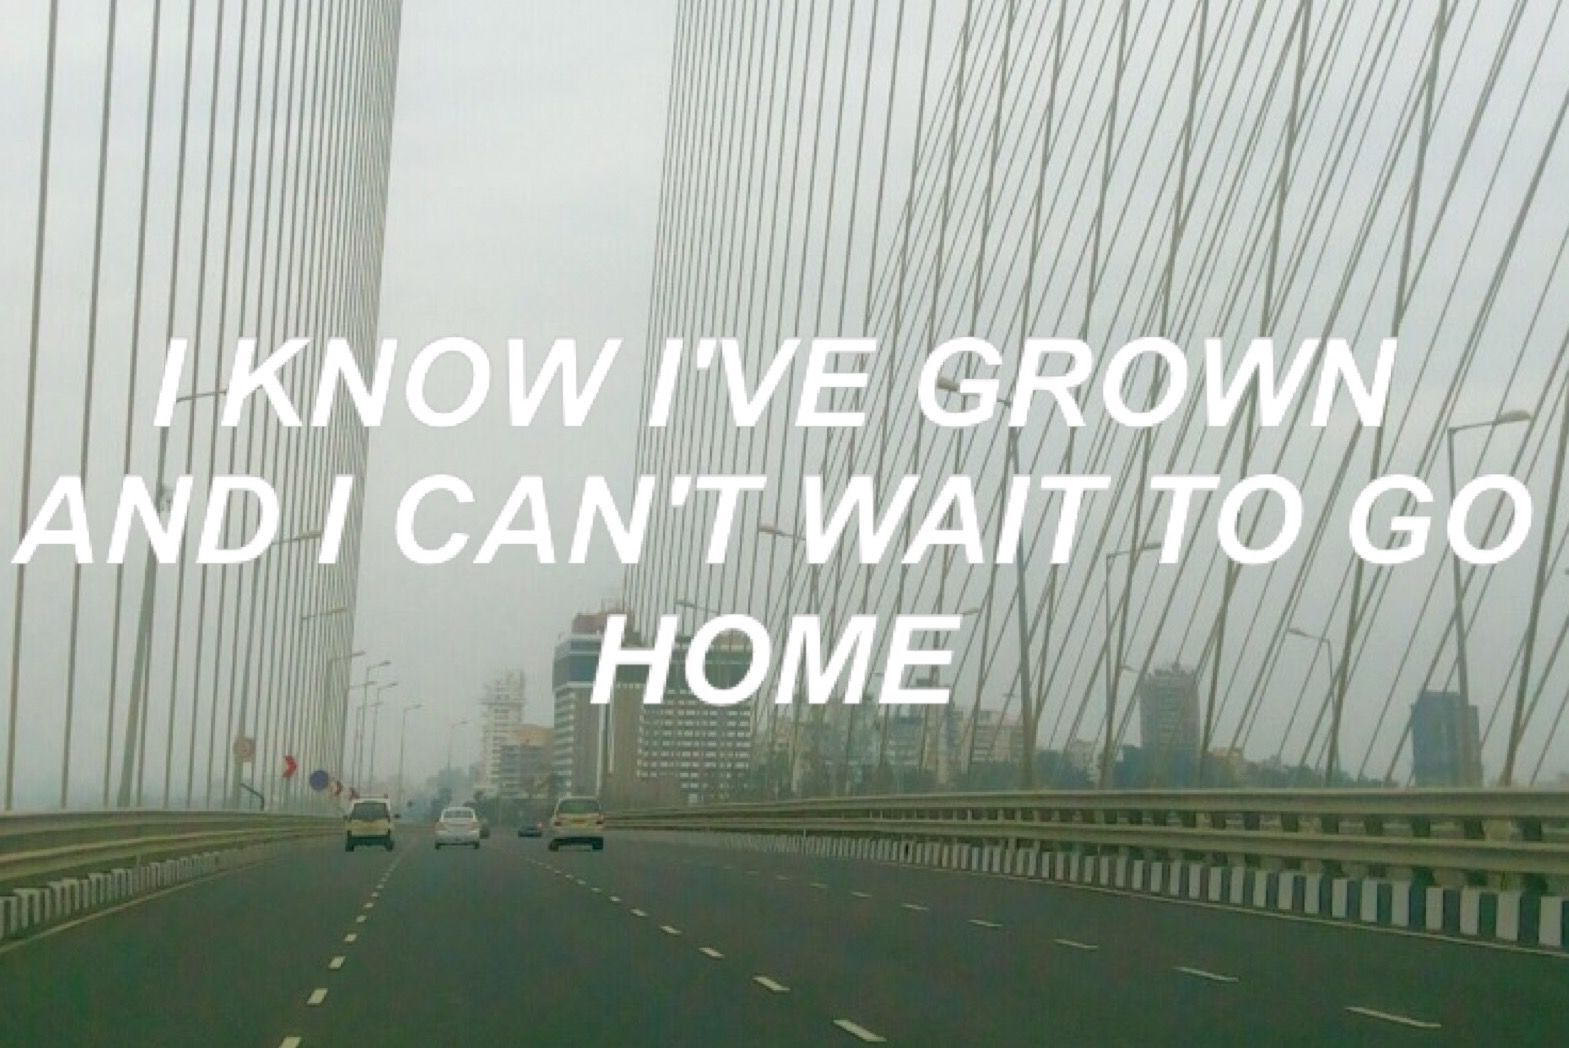 Ed Sheeran - Perfect (cover) | Generations of Music | Pinterest ...